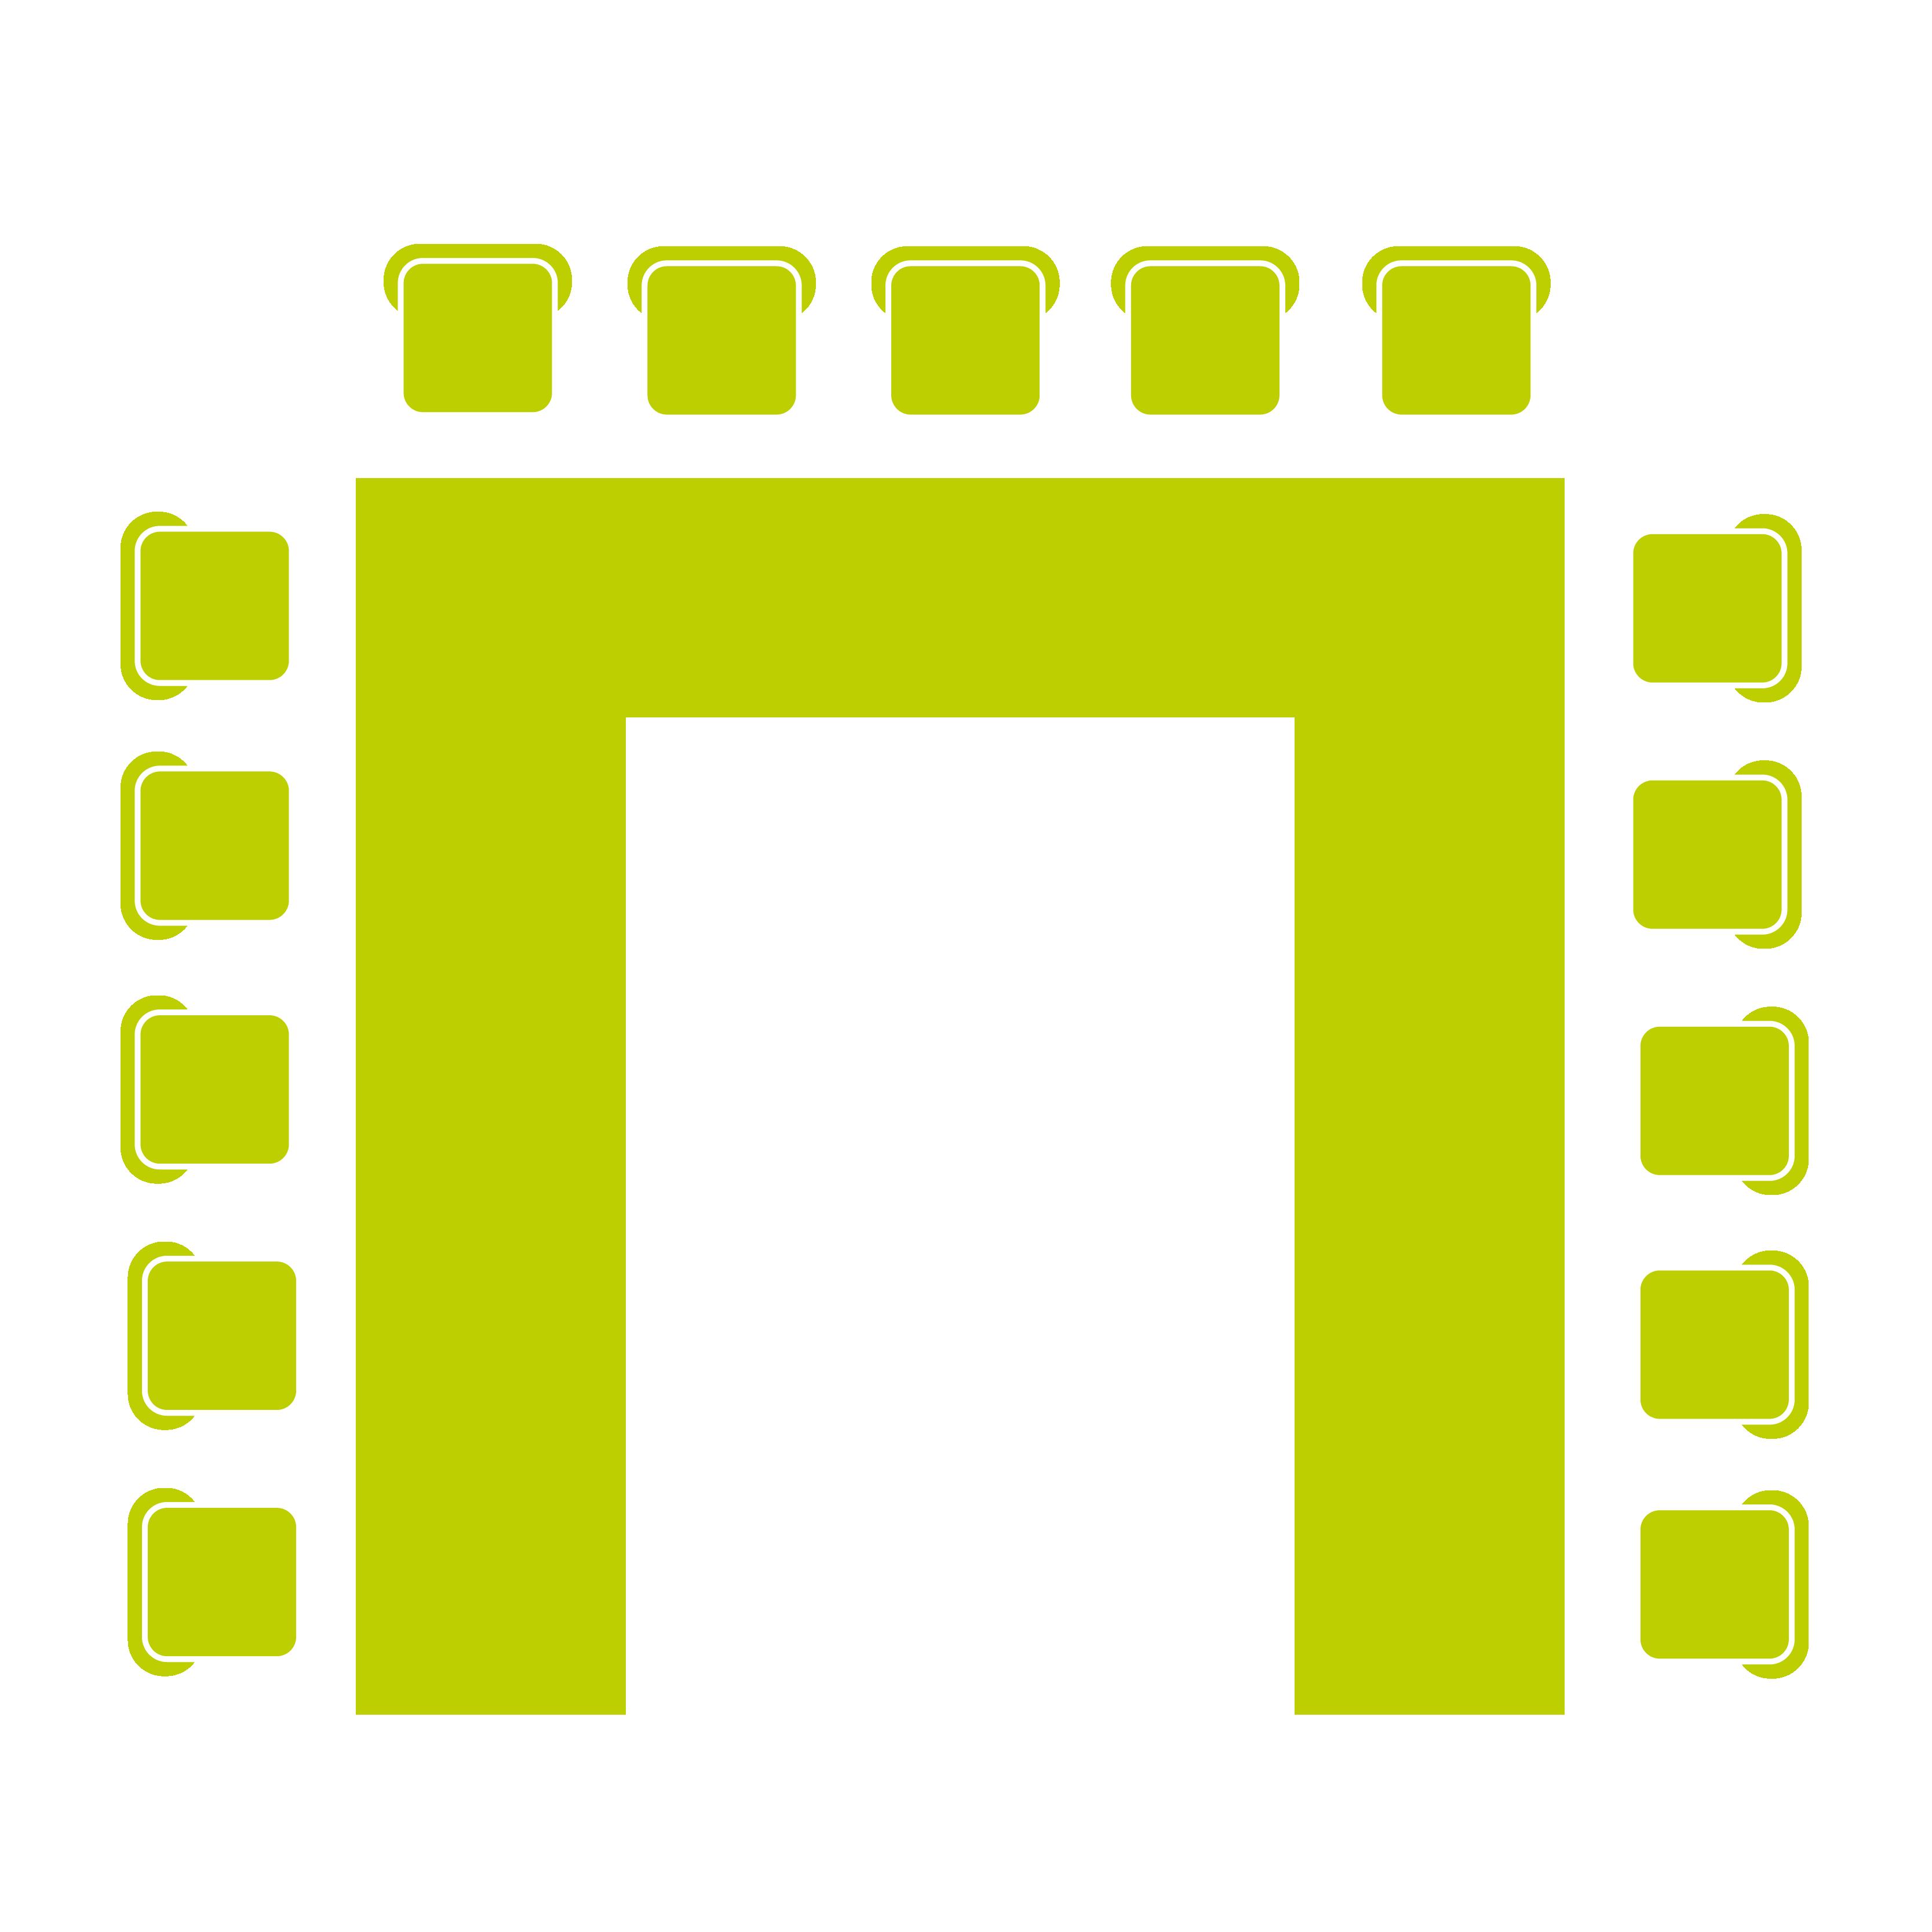 Square clipart shape person. Octigons free on dumielauxepices